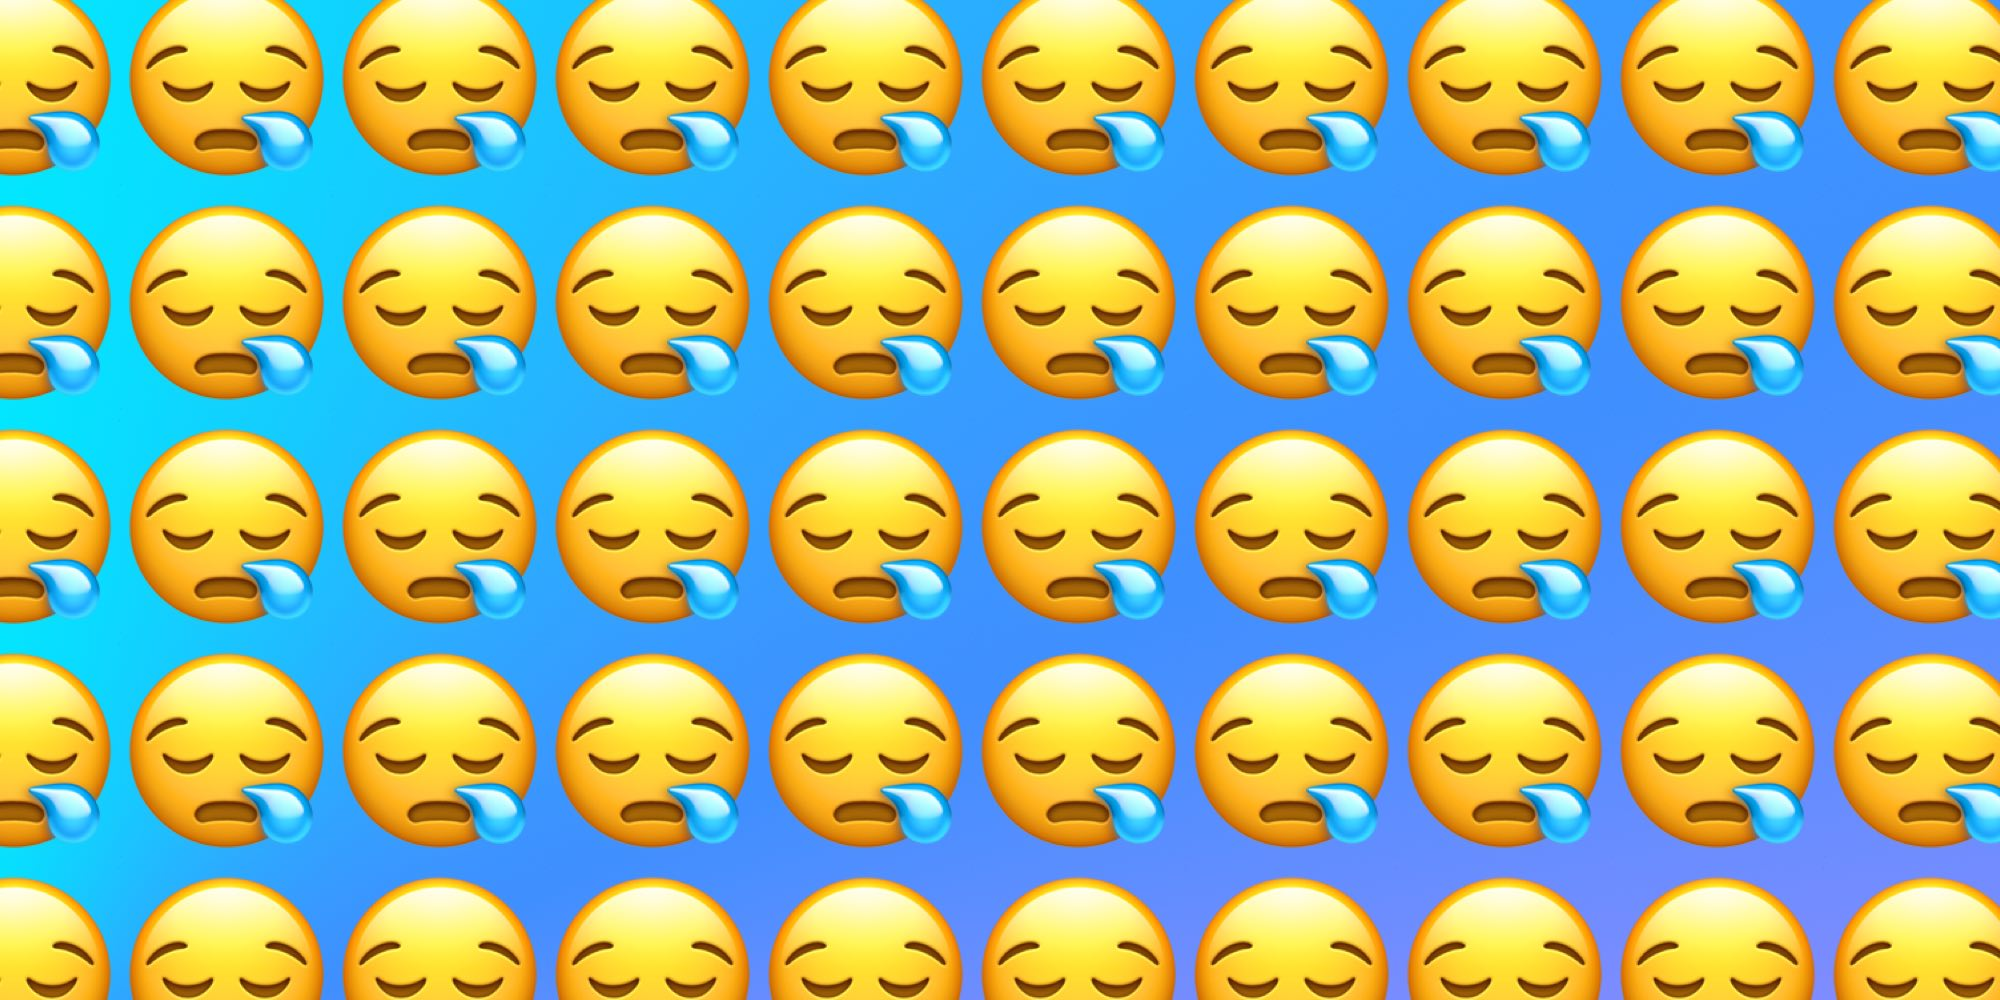 Emojiology: 😪 Sleepy Face